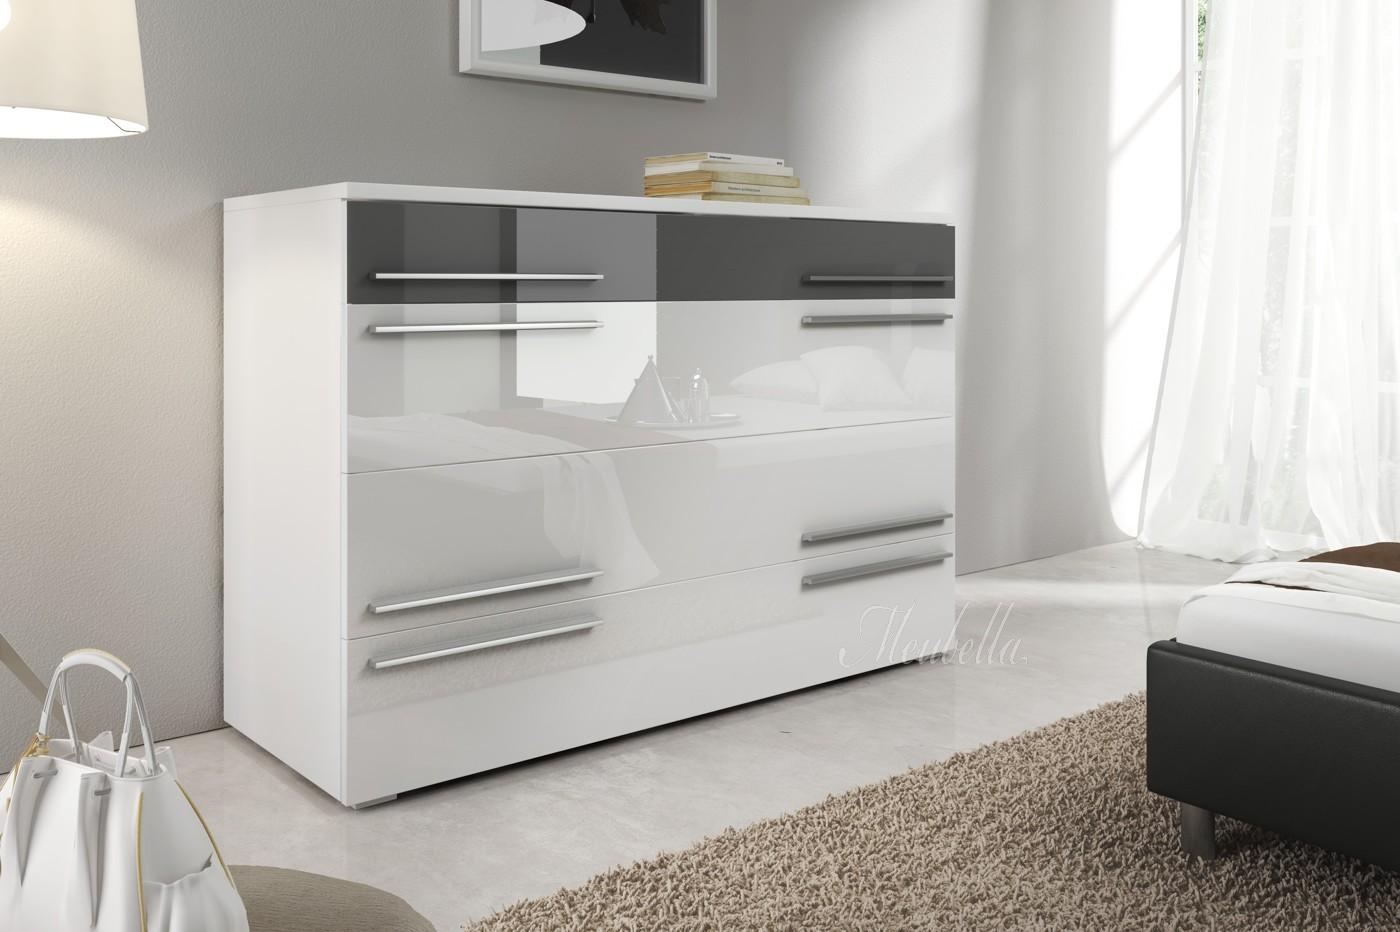 Commode costello grijs wit 120 cm meubella - Trendy slaapkamer ...